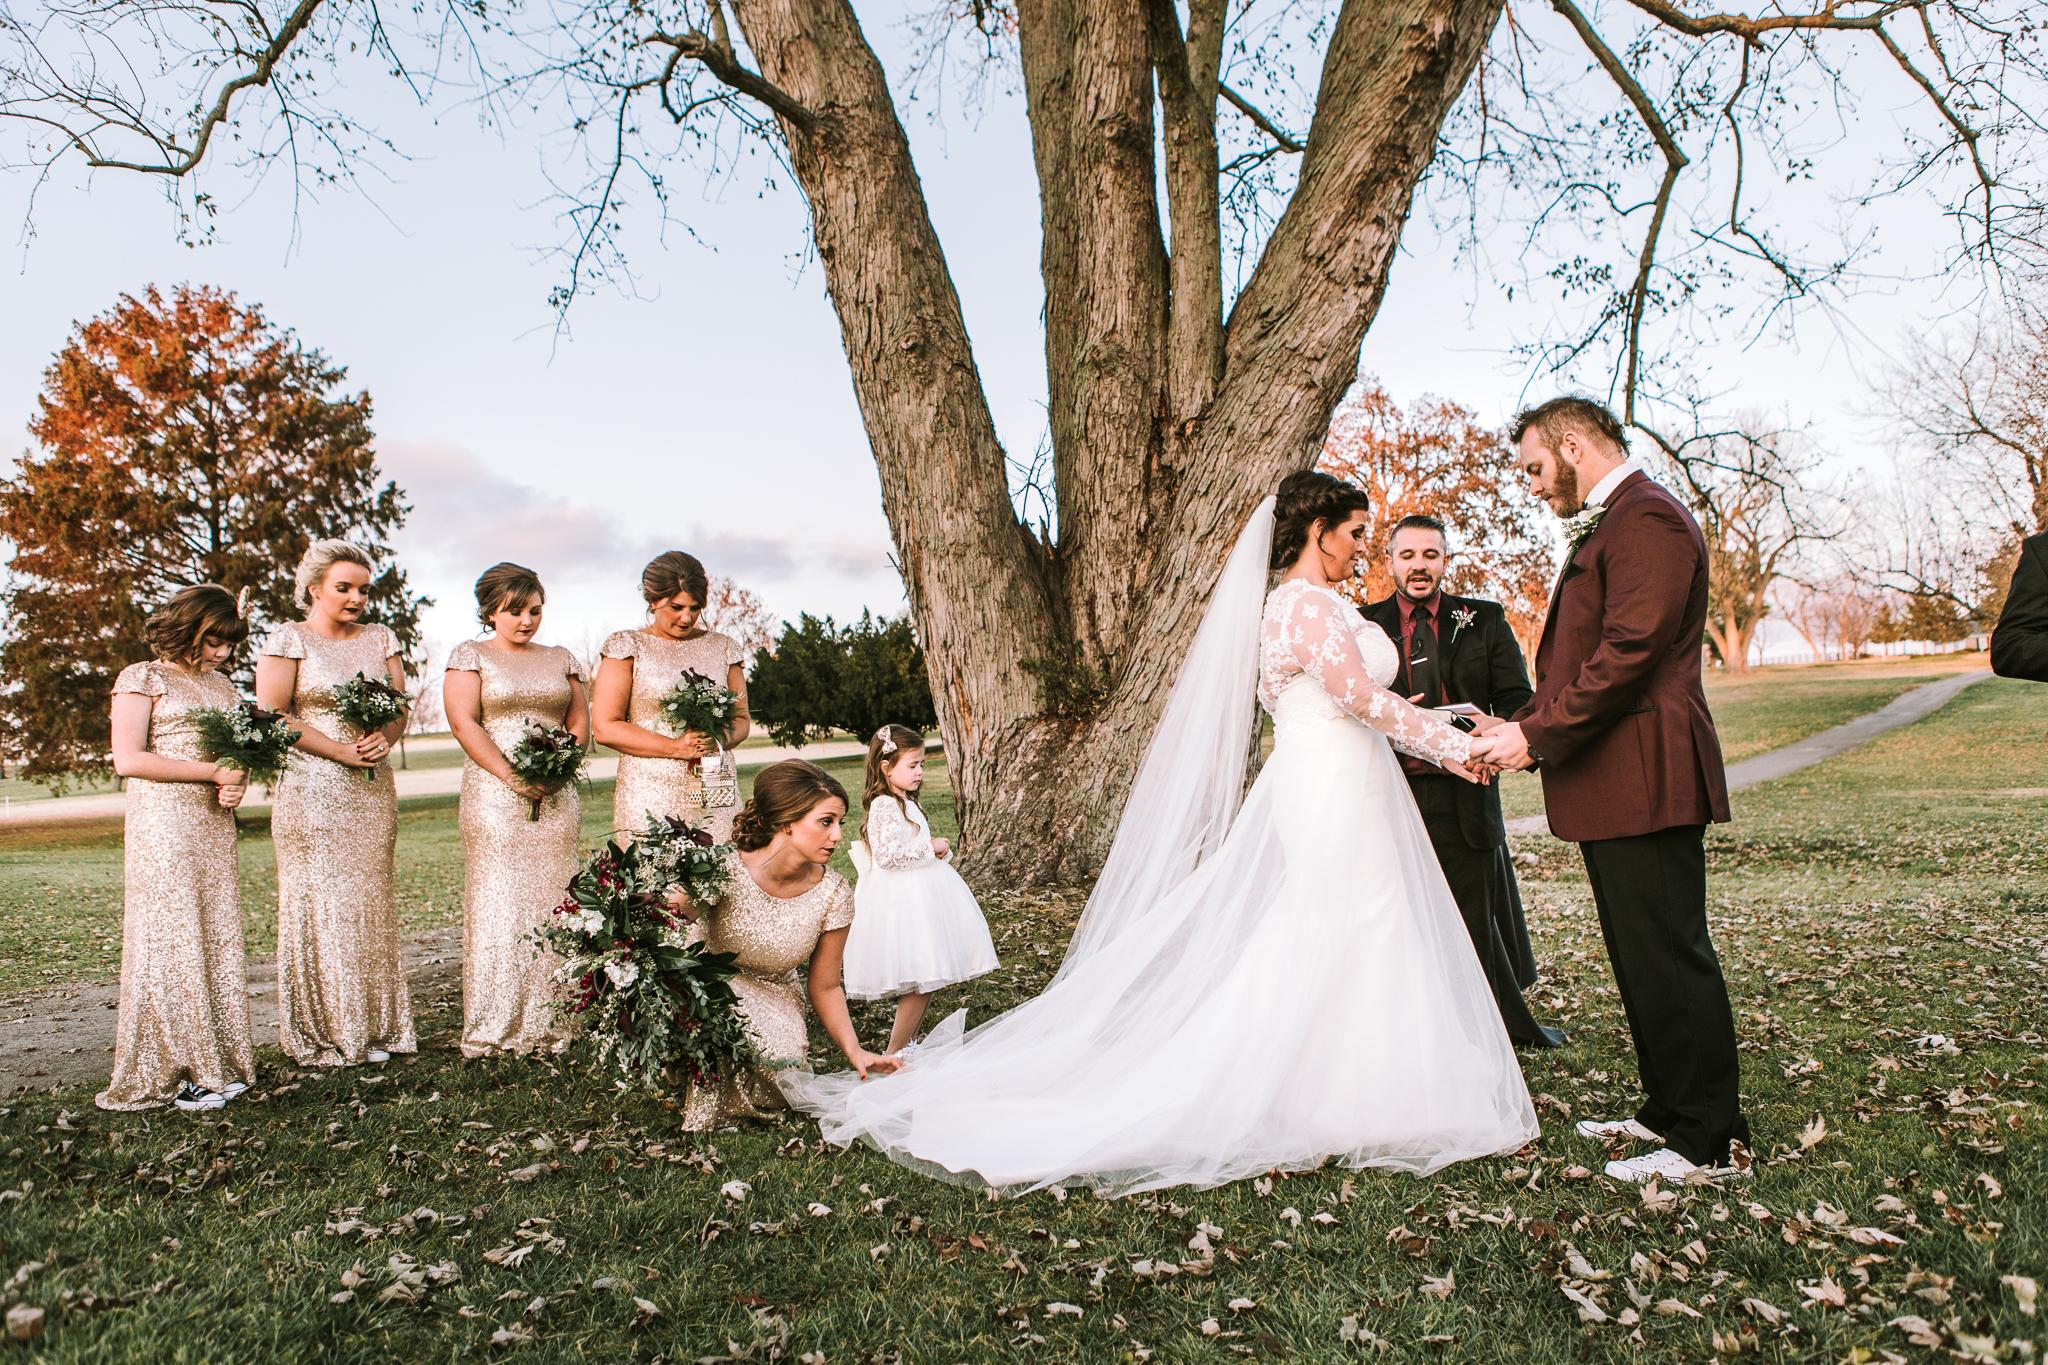 Richmond Kentucky Wedding Photographer - Ariana Jordan Photography -24.jpg